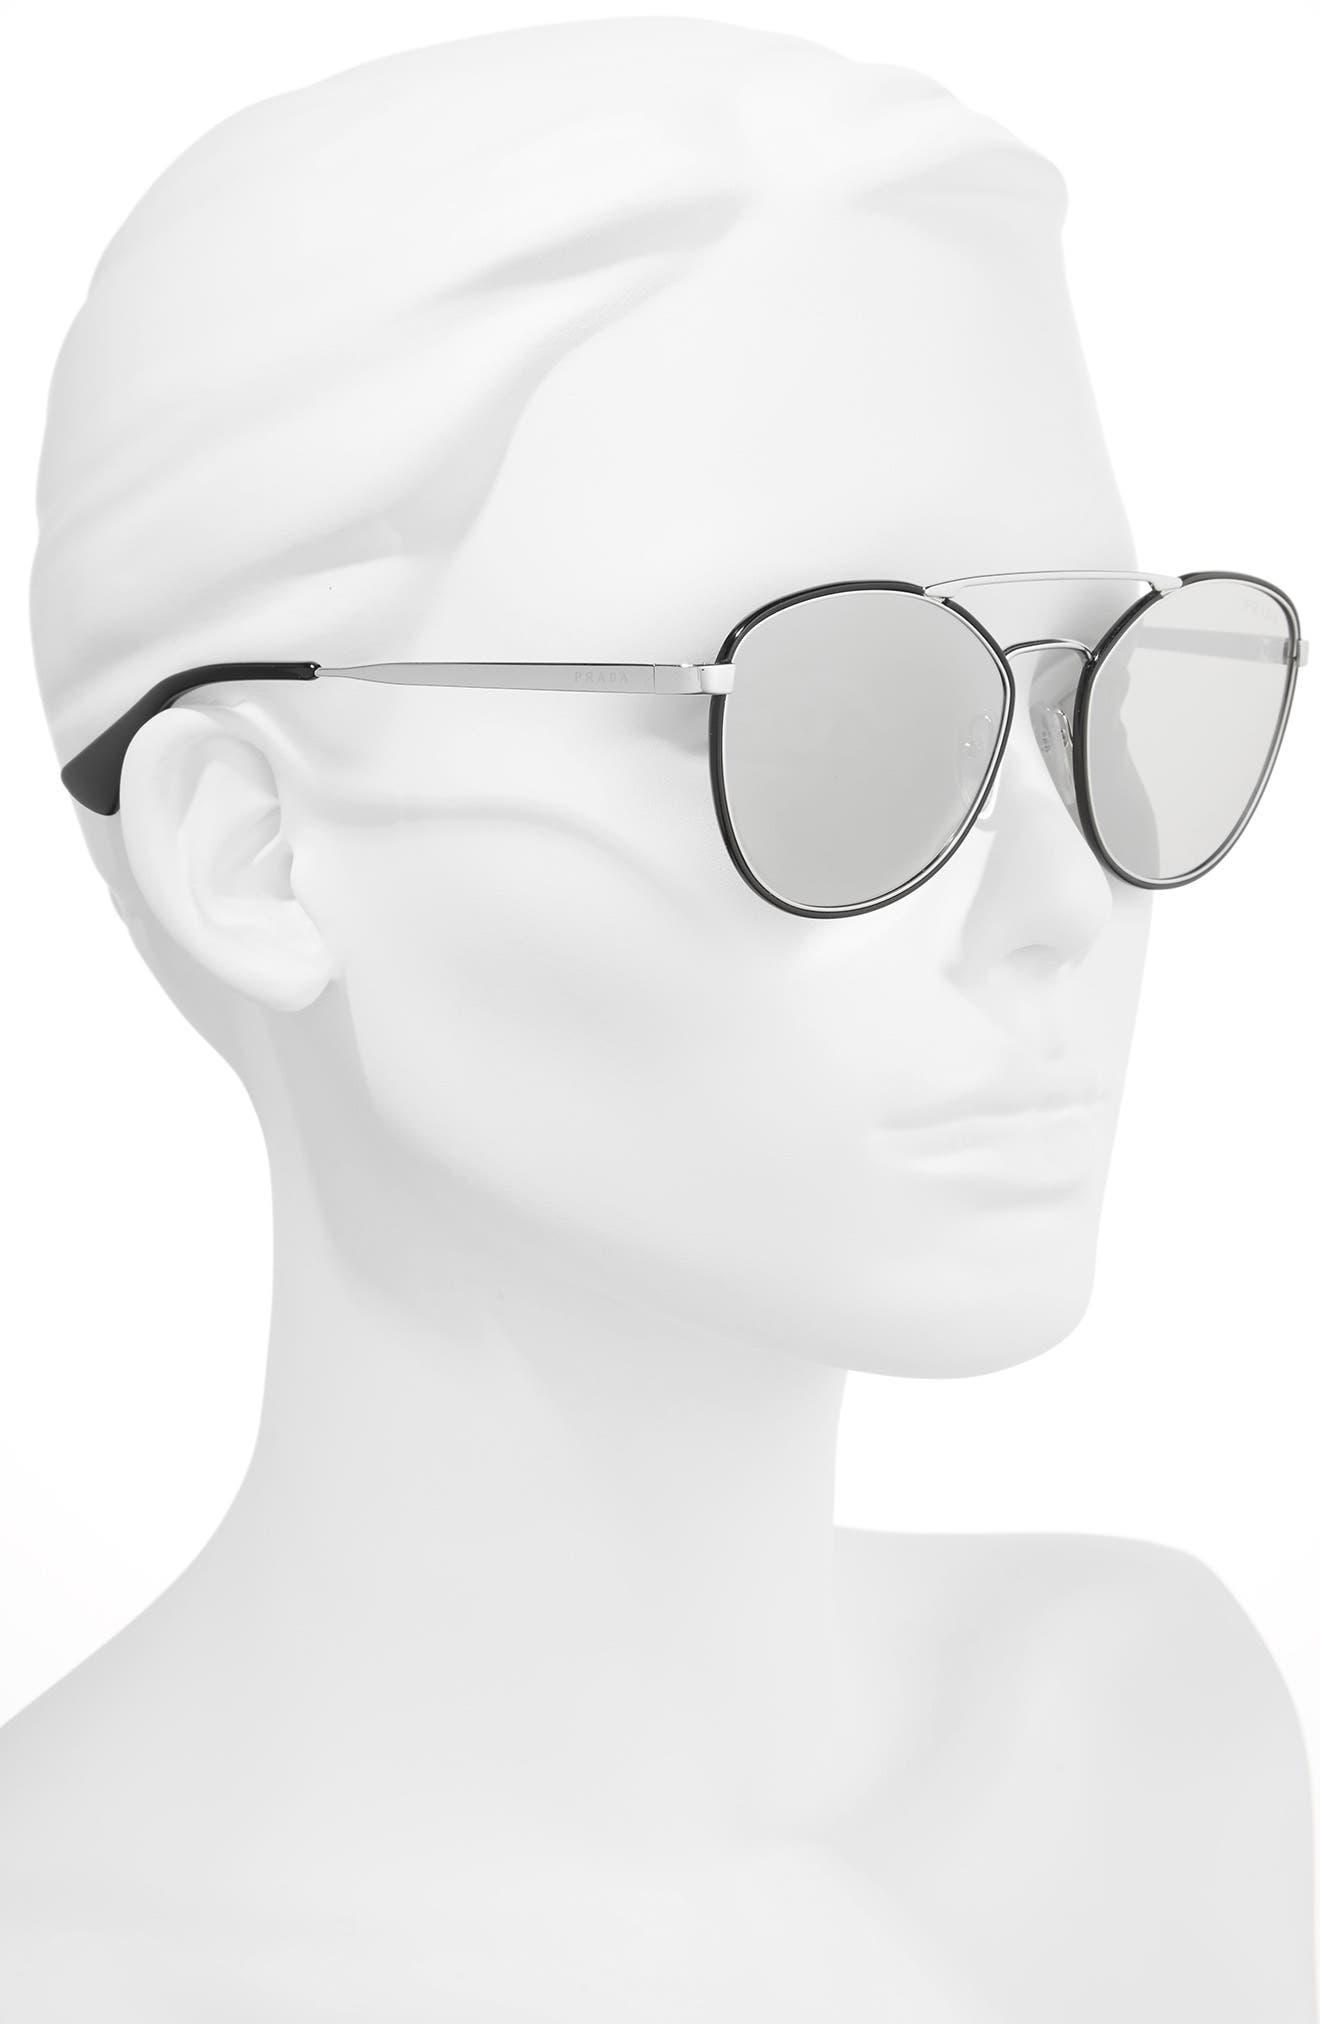 55mm Mirrored Aviator Sunglasses,                             Alternate thumbnail 2, color,                             001